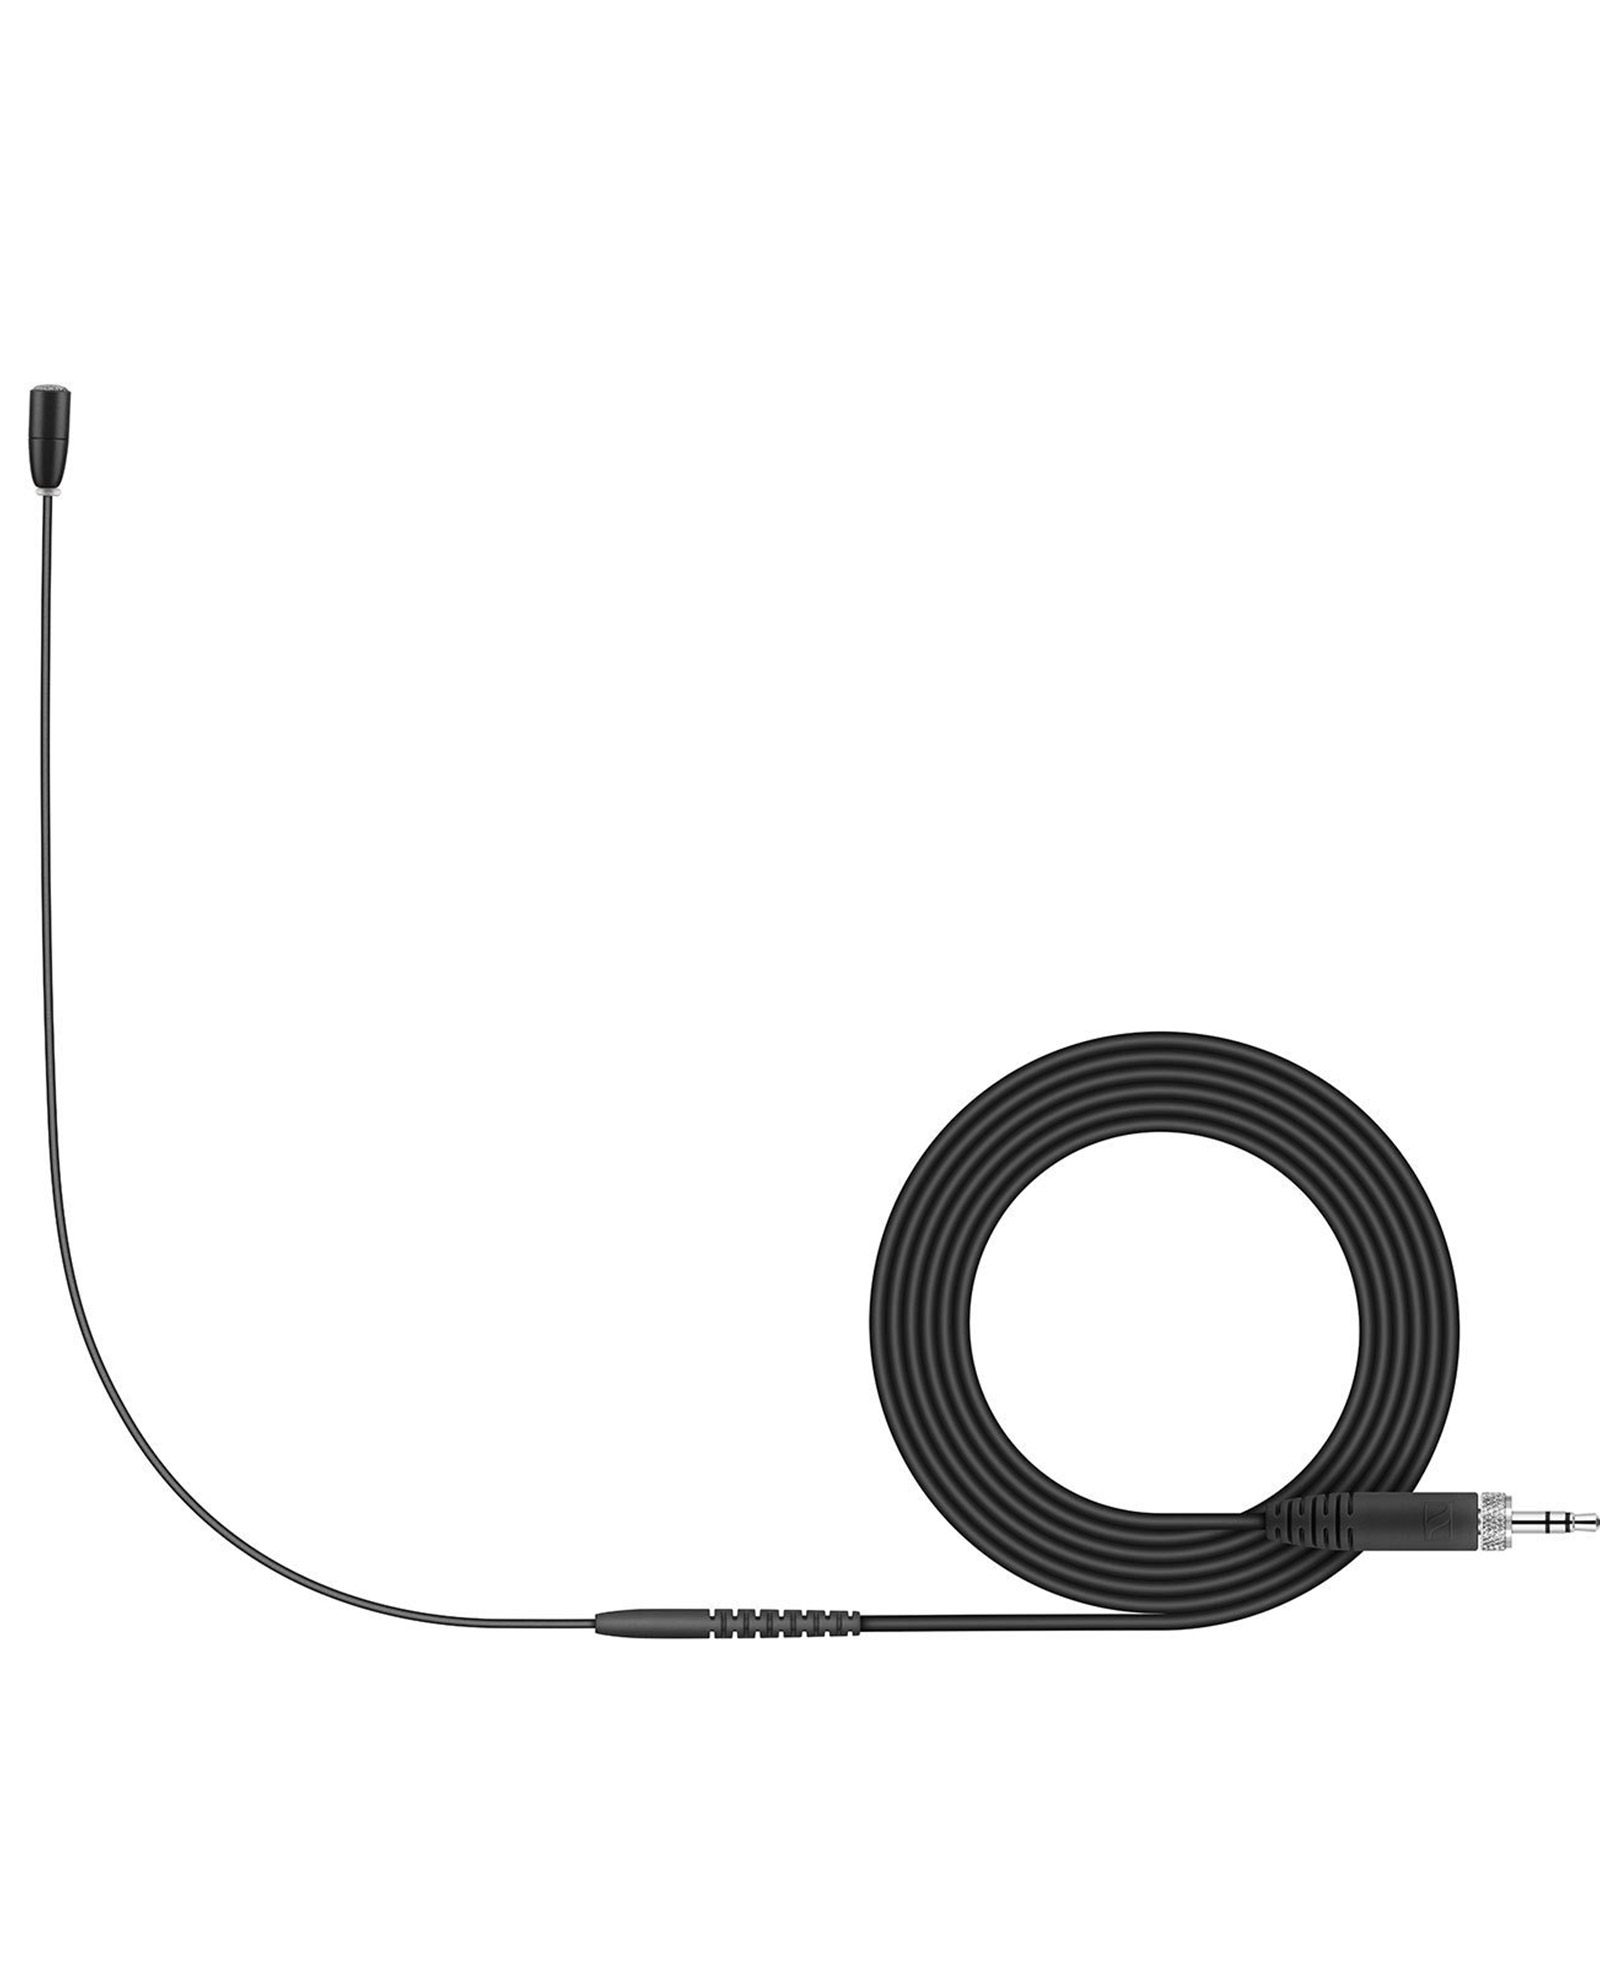 Sennheiser Hsp Essential Omni Neckworn Microphone 3